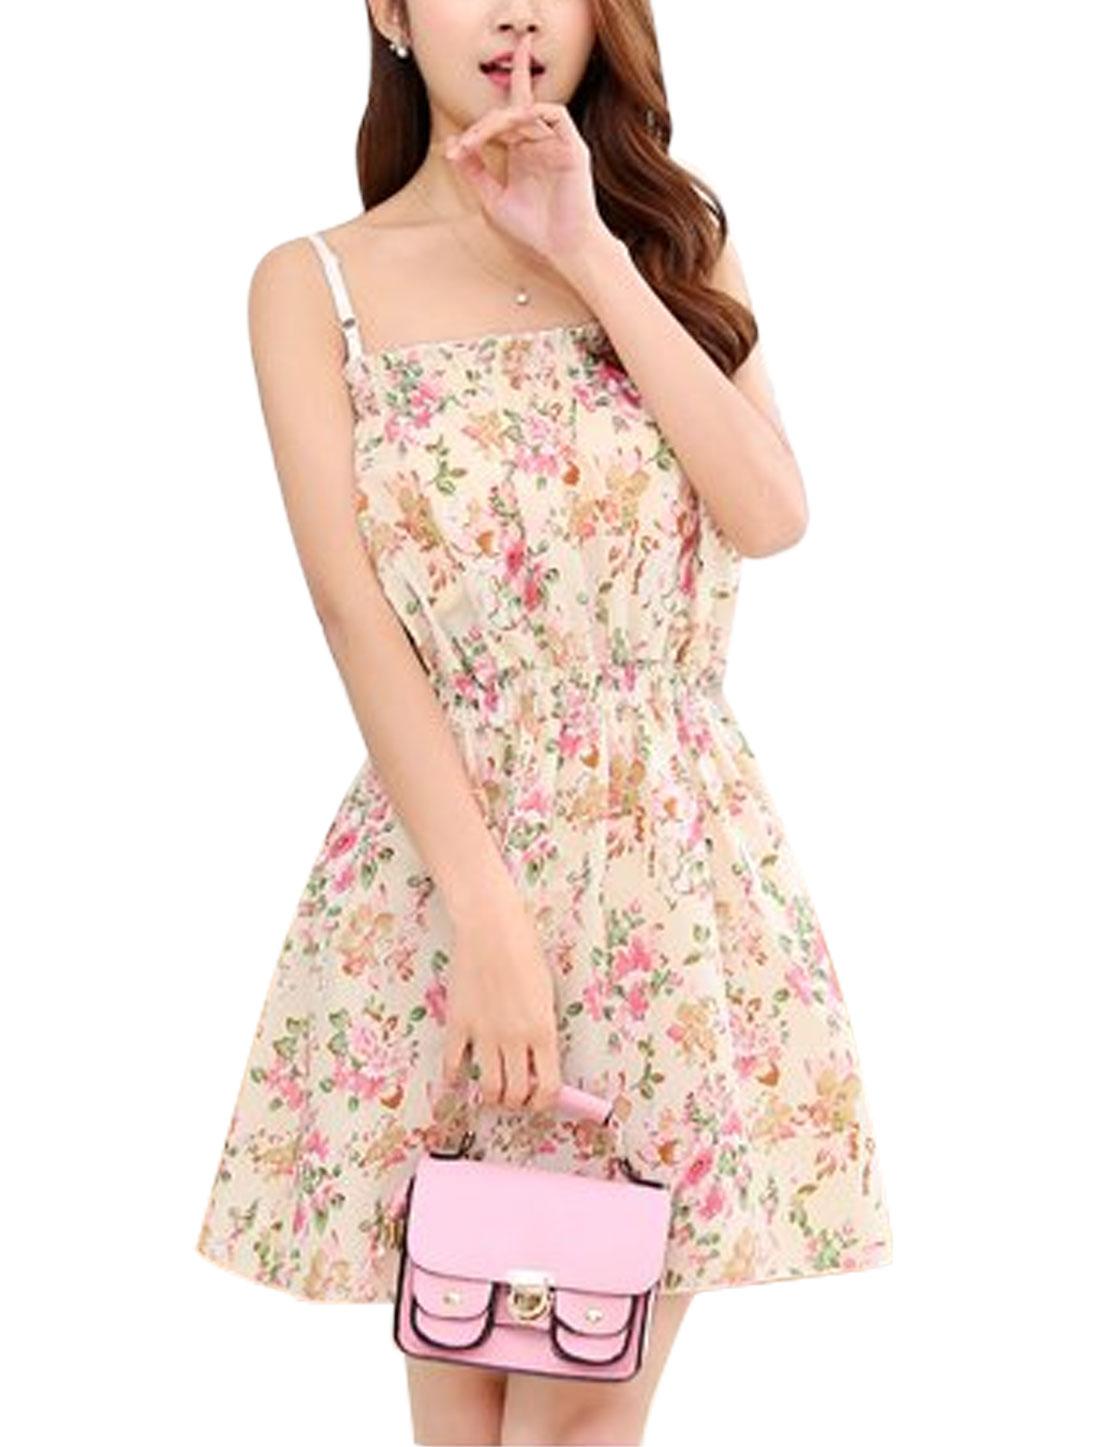 Woman Floral Prints Elastic Waist Adjustable Shoulder Straps Dress Beige XS